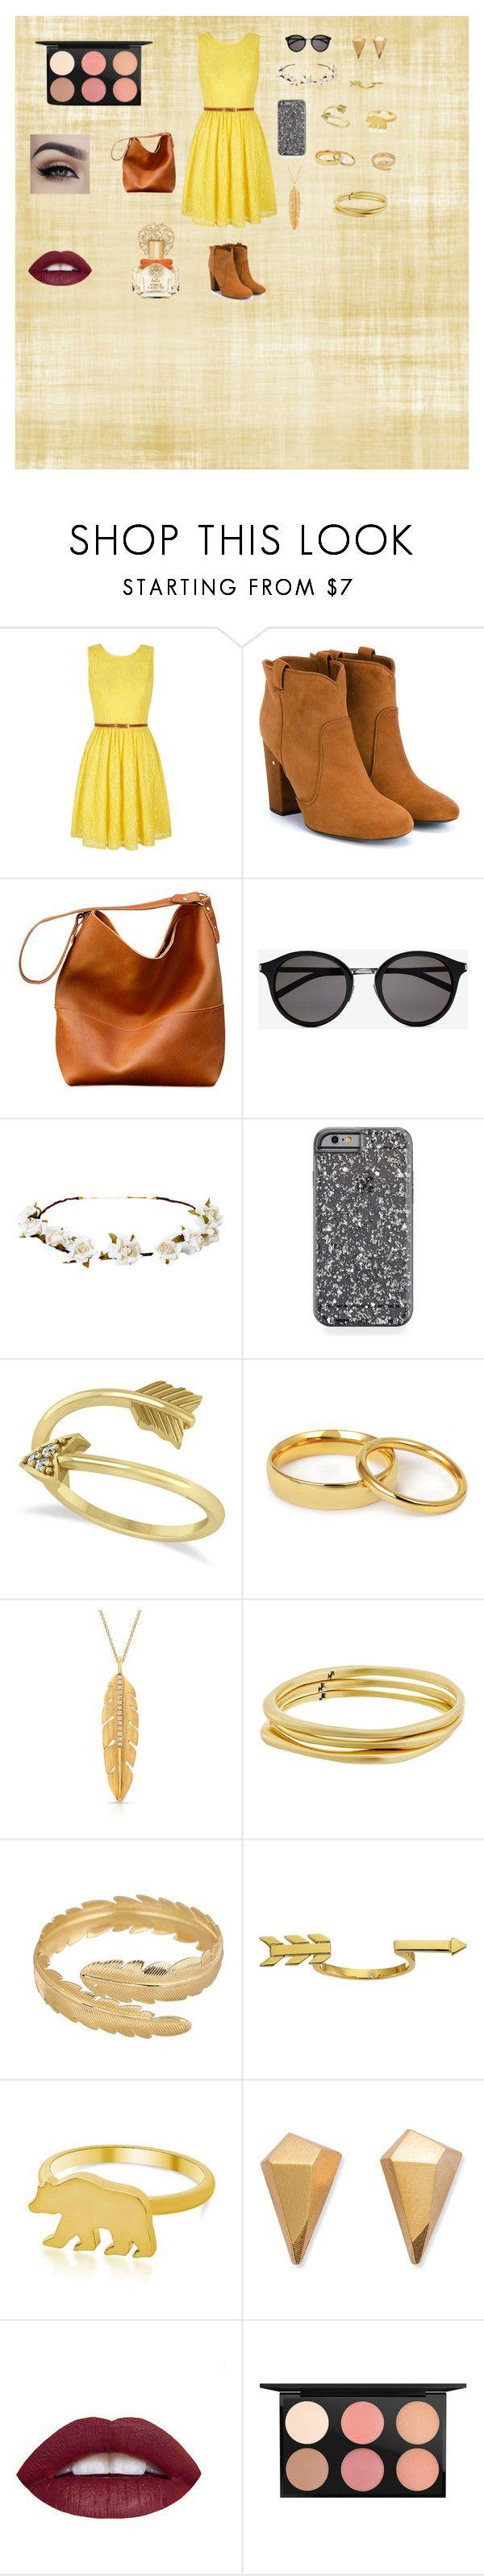 moda amarilla by maryleyma on Polyvore featuring Belleza, MAC Cosmetics, Vince Camuto, Yves Saint Laurent, Cult Gaia, Allurez, Karen Kane, George & Laurel, Gorjana and Yumi